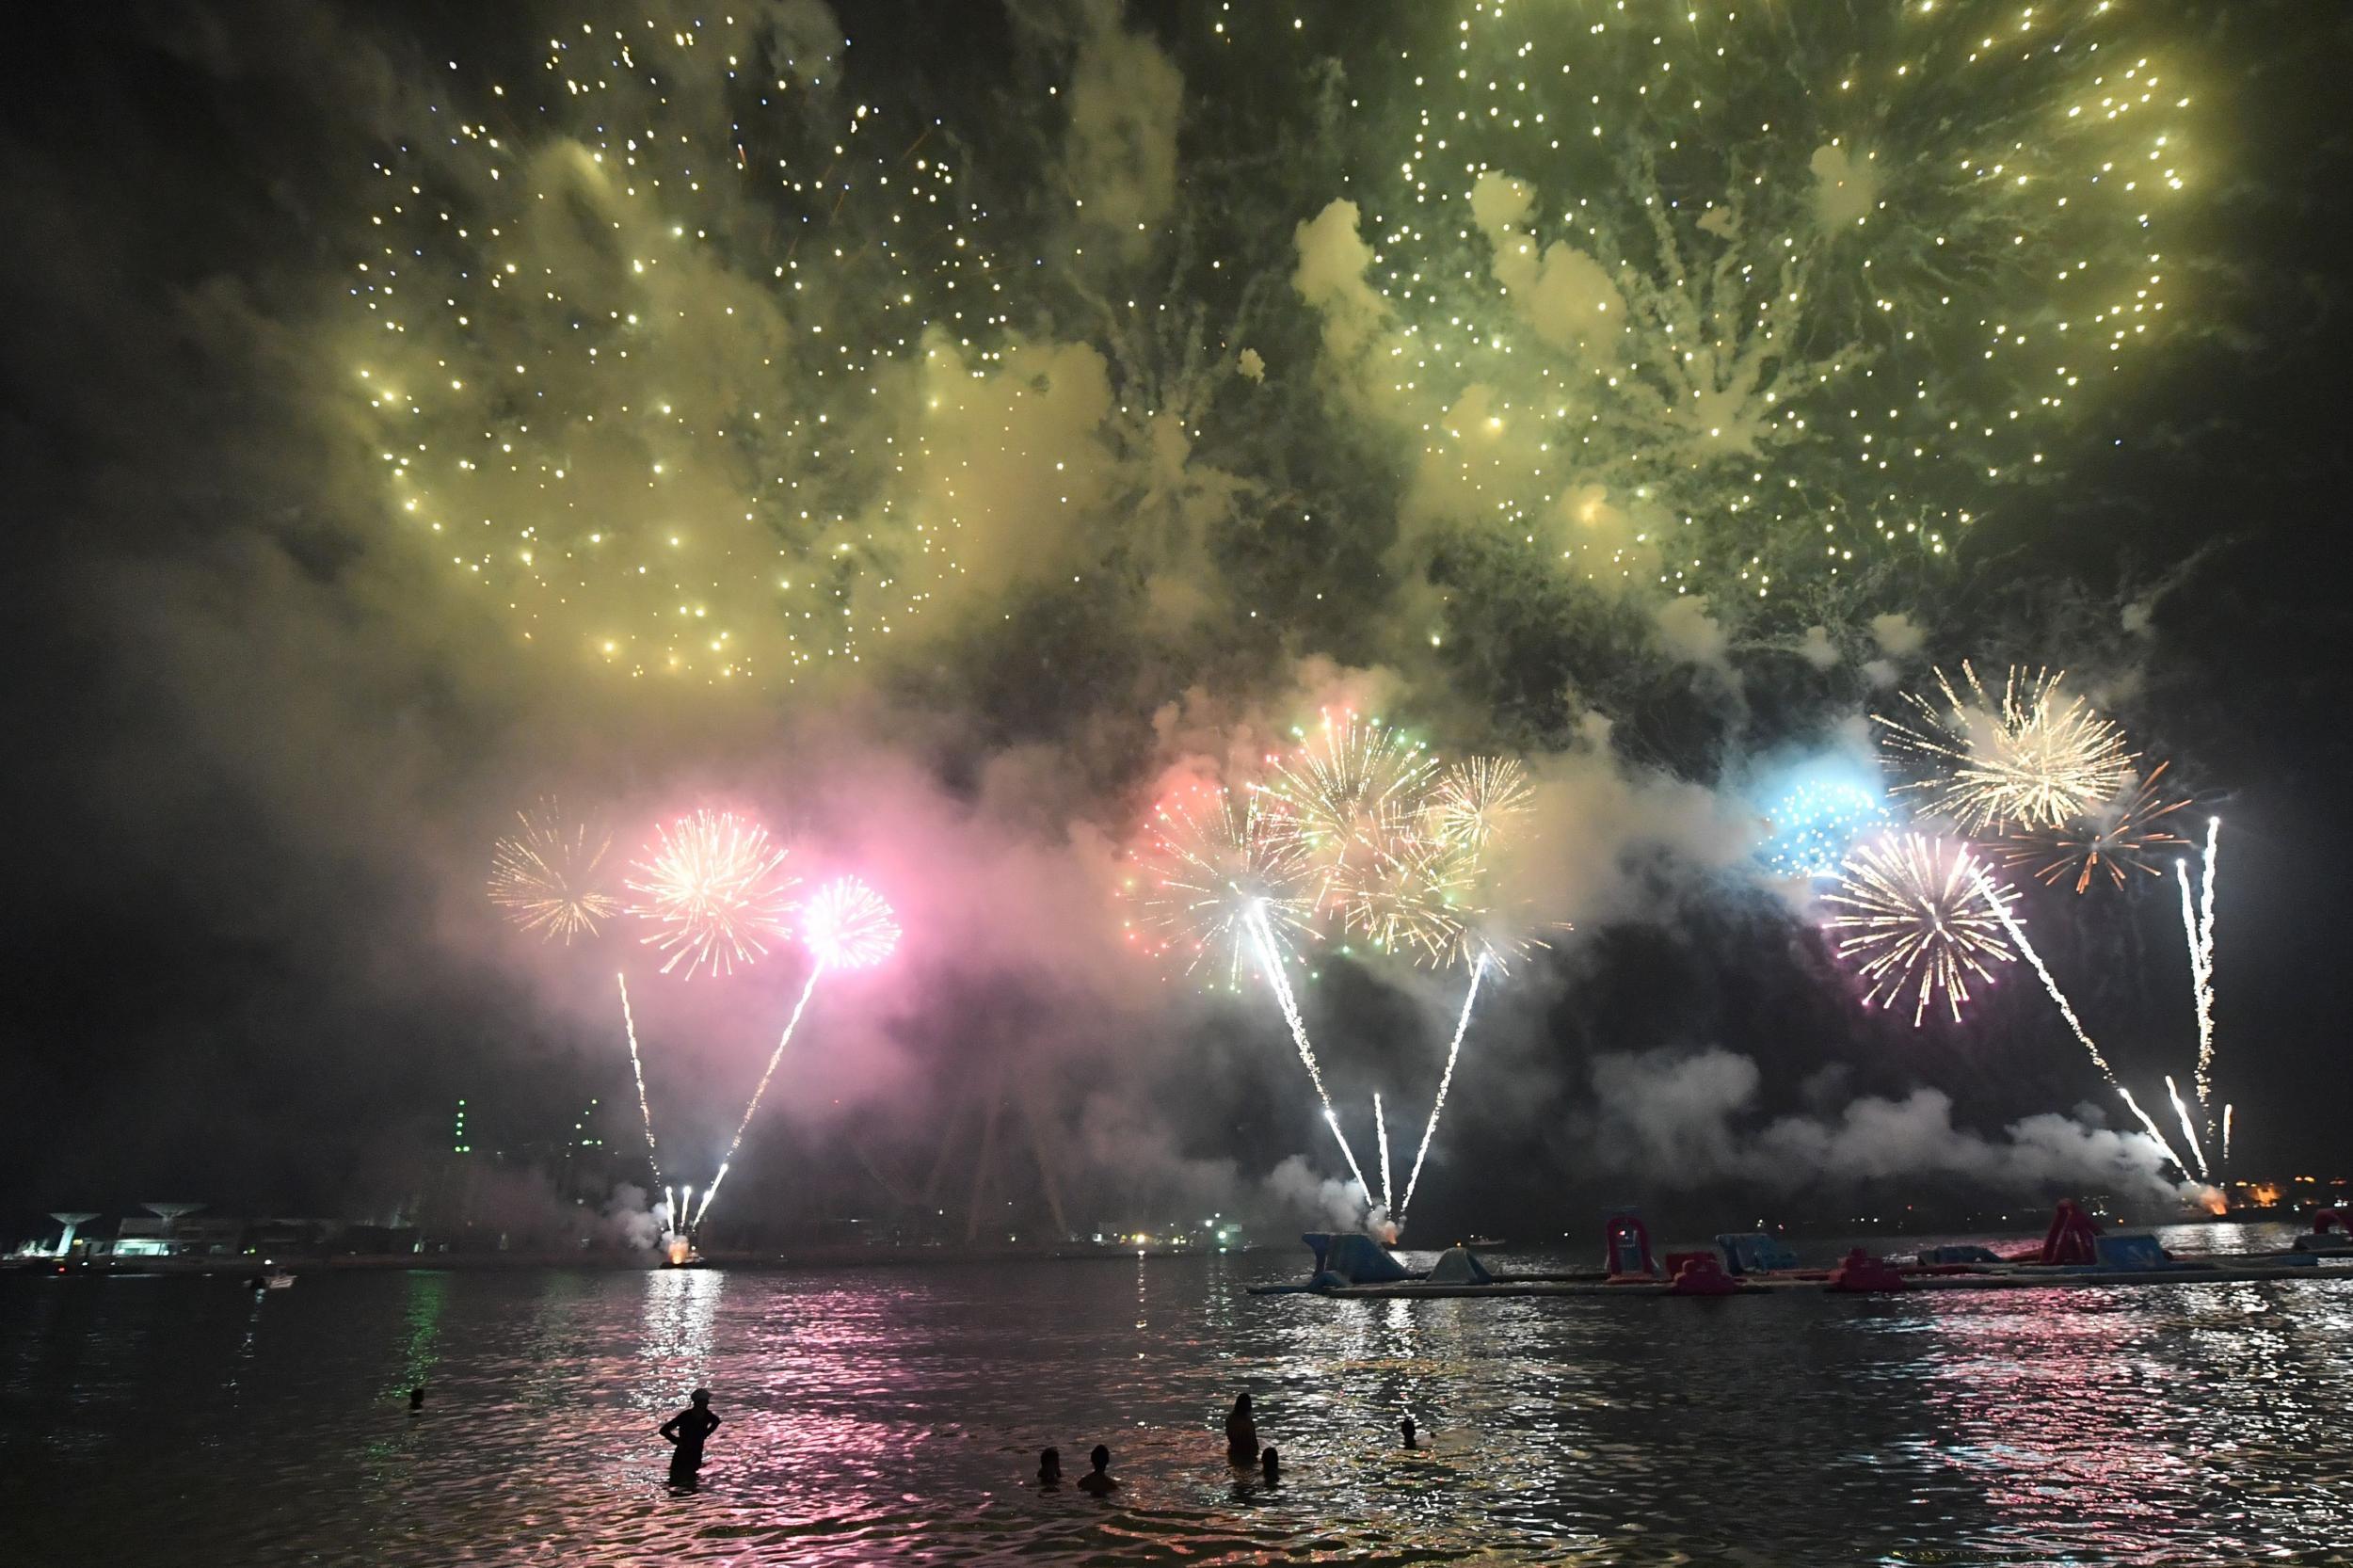 eid al adha 2018 - photo #4